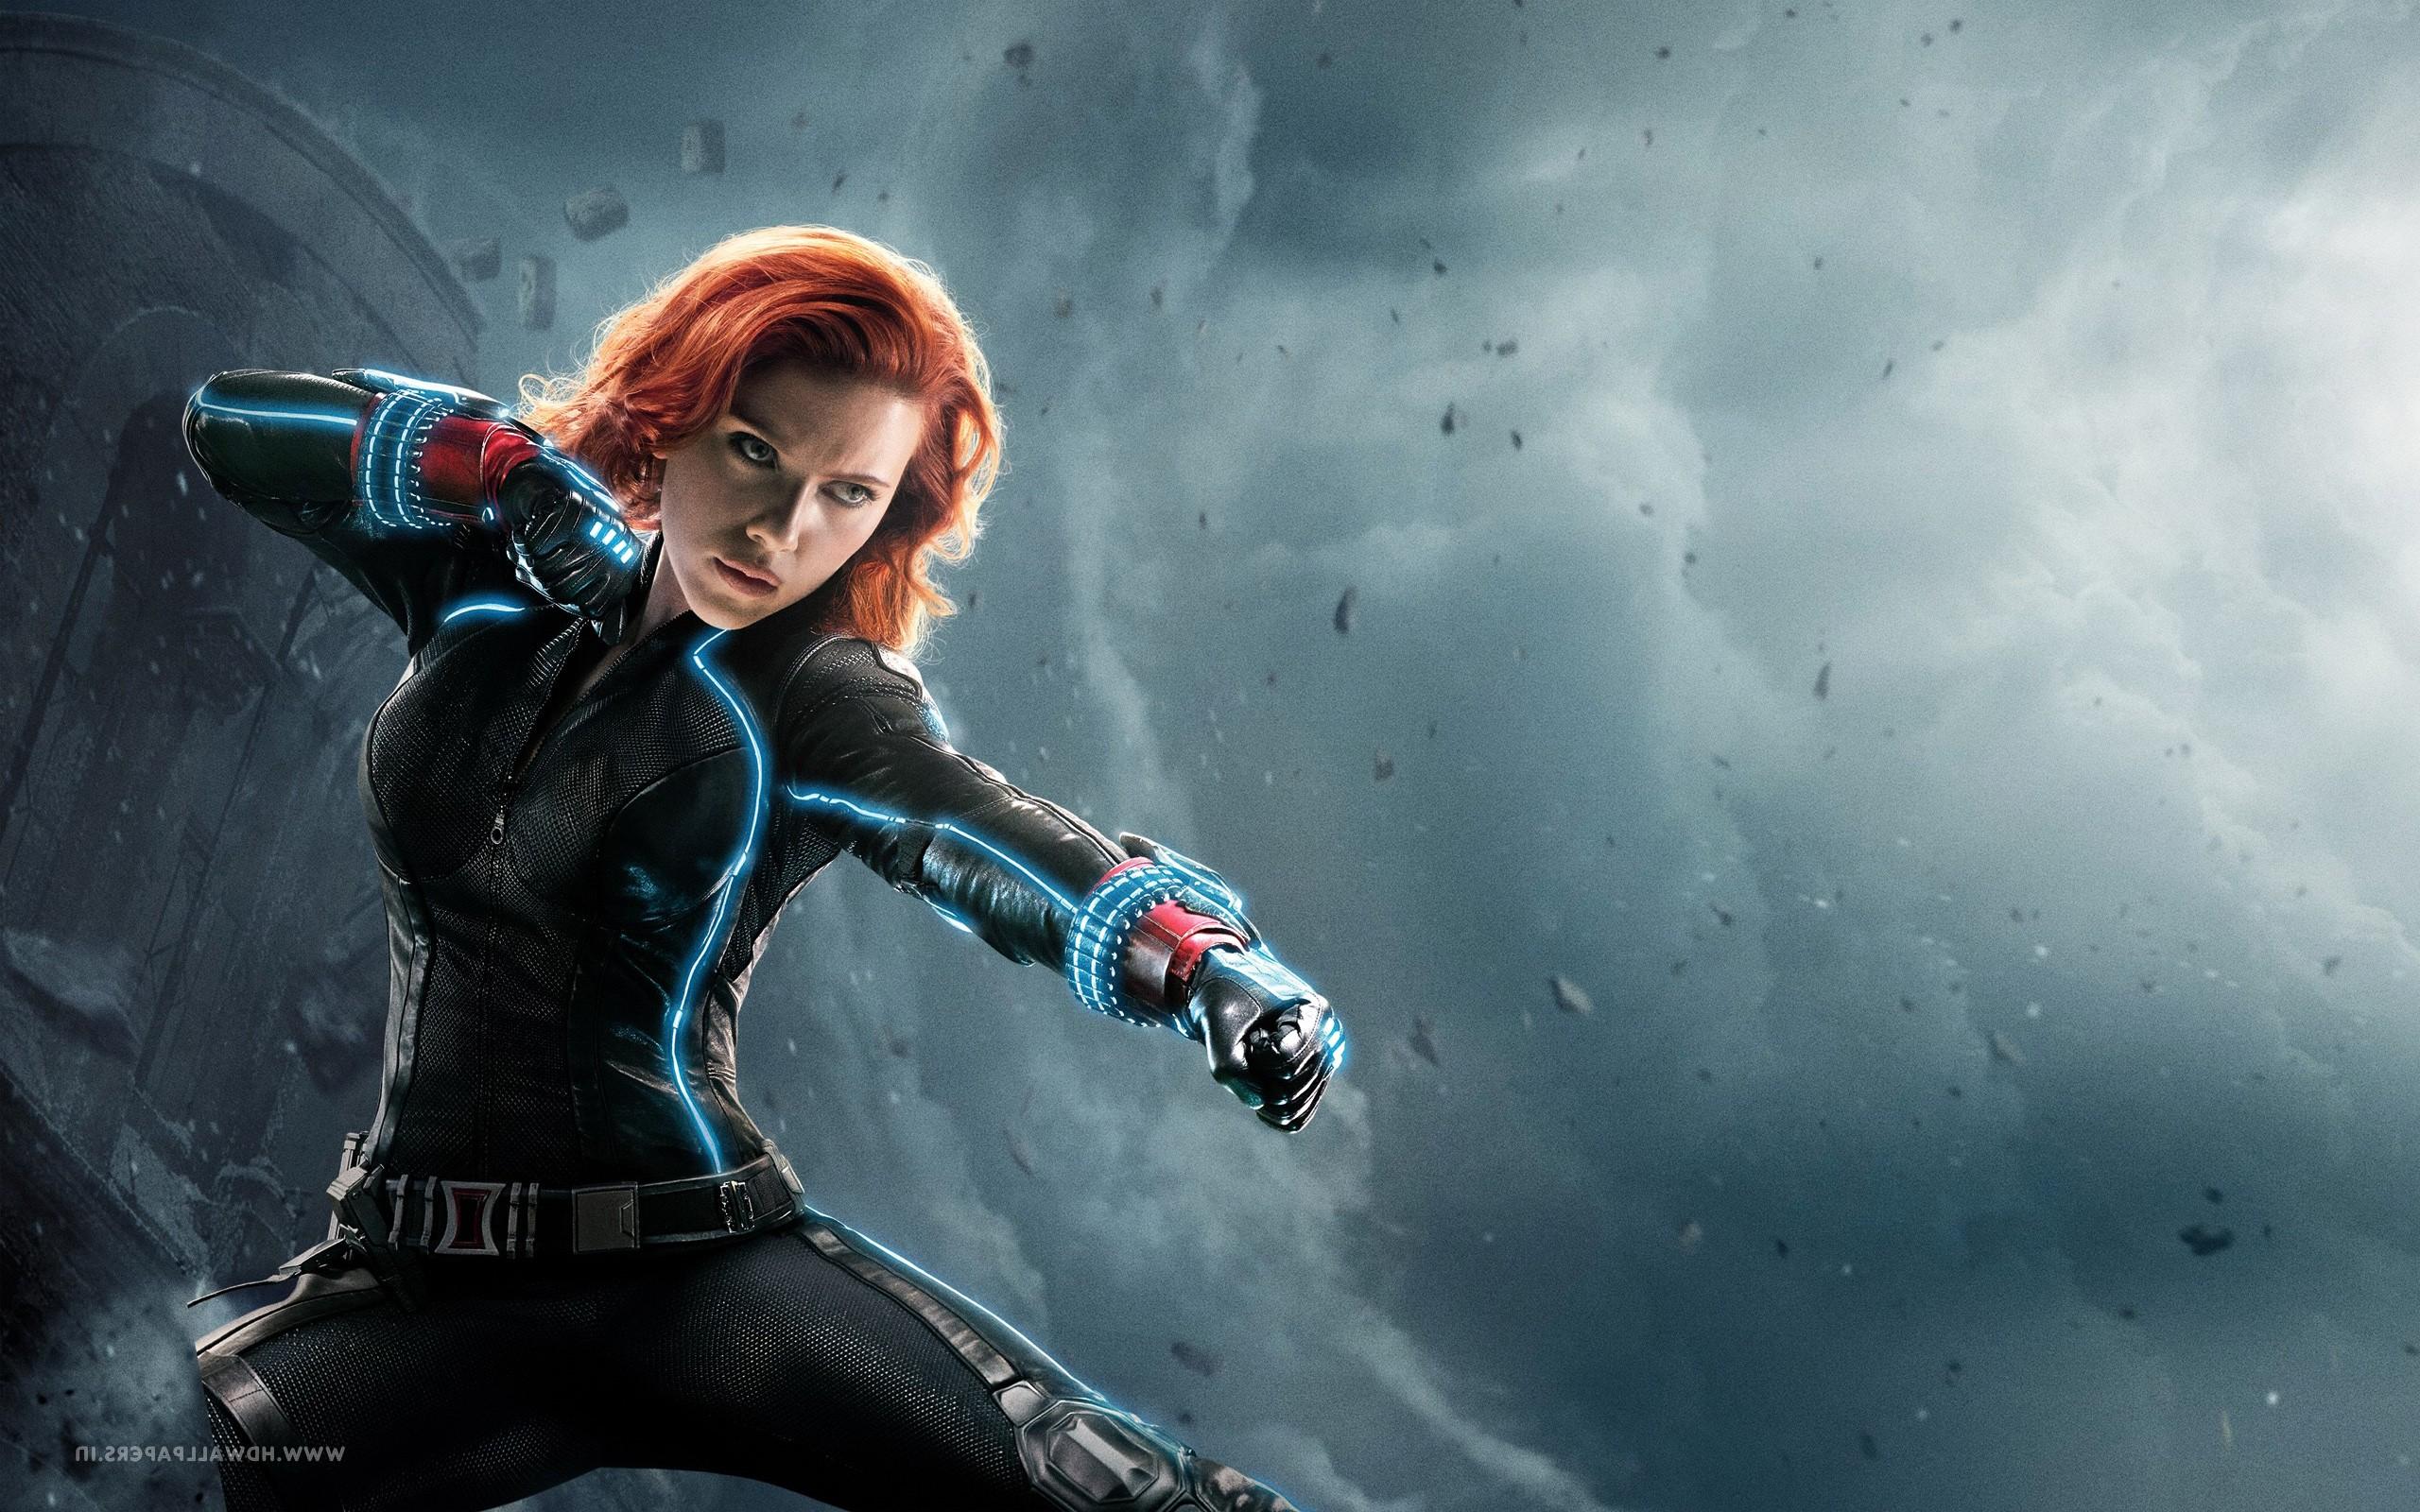 Black Widow Age Ultron: Avengers Age Of Ultron Black Widow, HD Movies, 4k